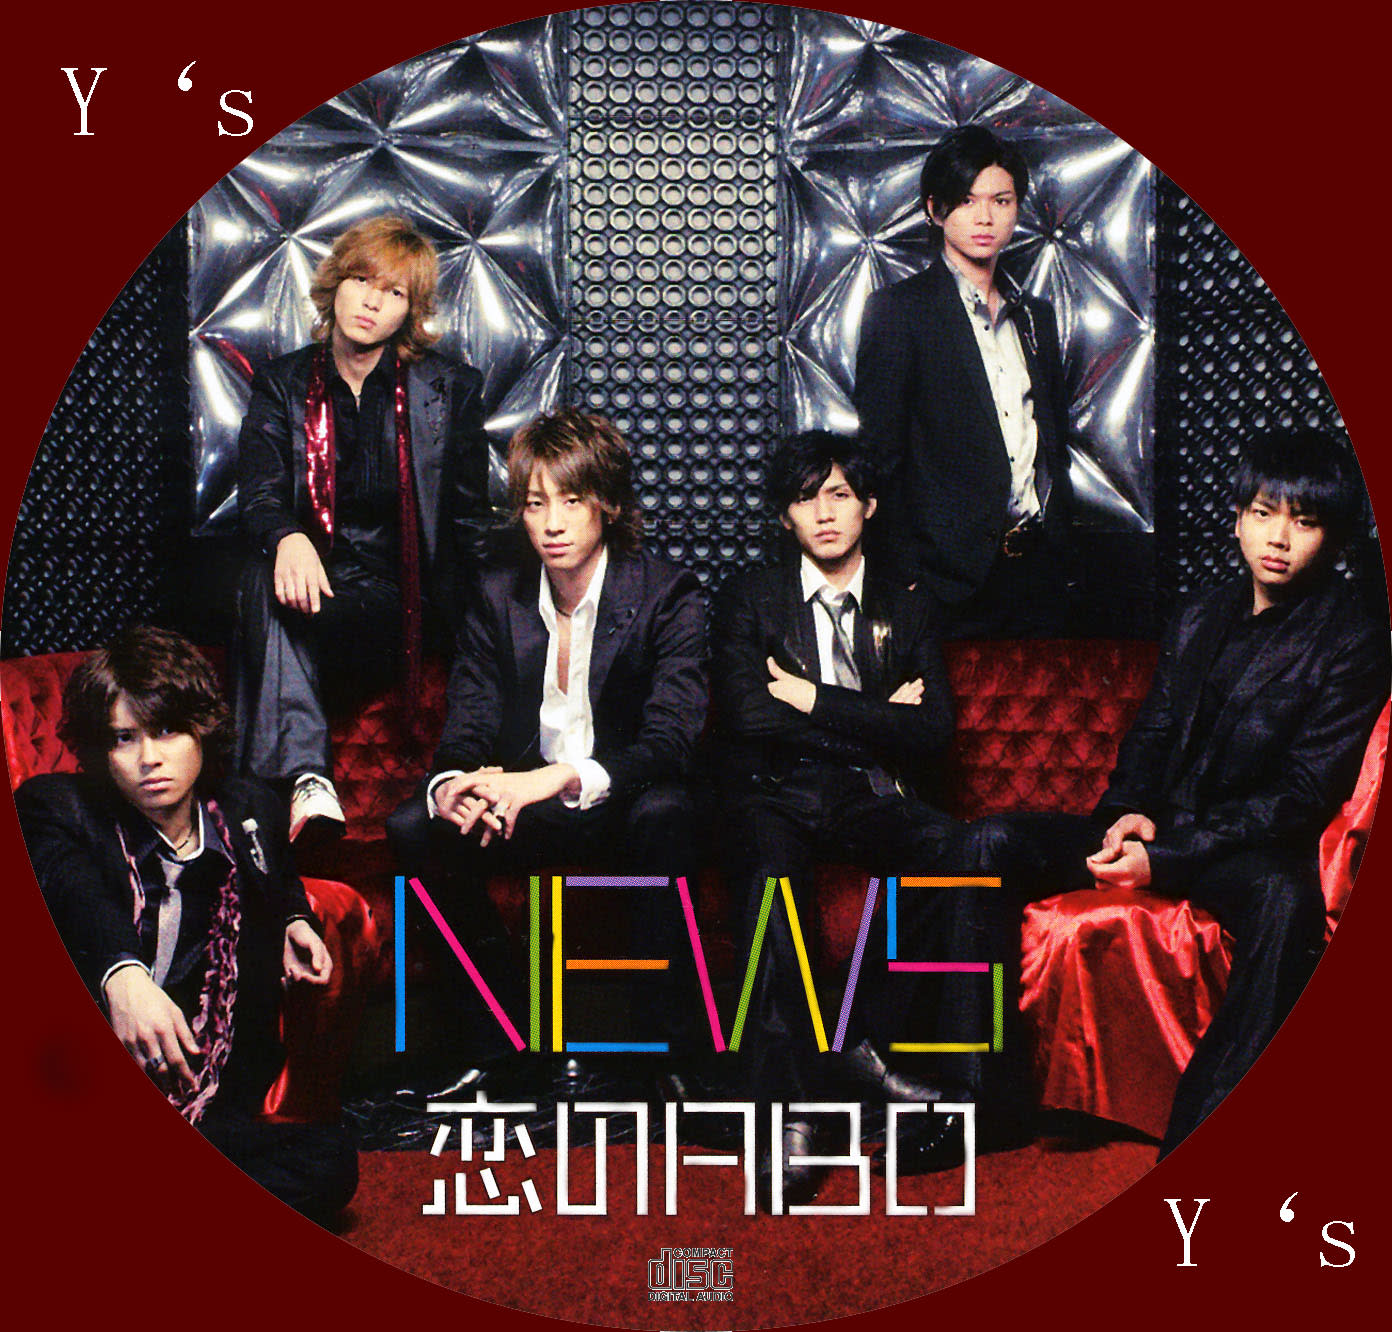 NEWS-恋のABO - Y's CAFE